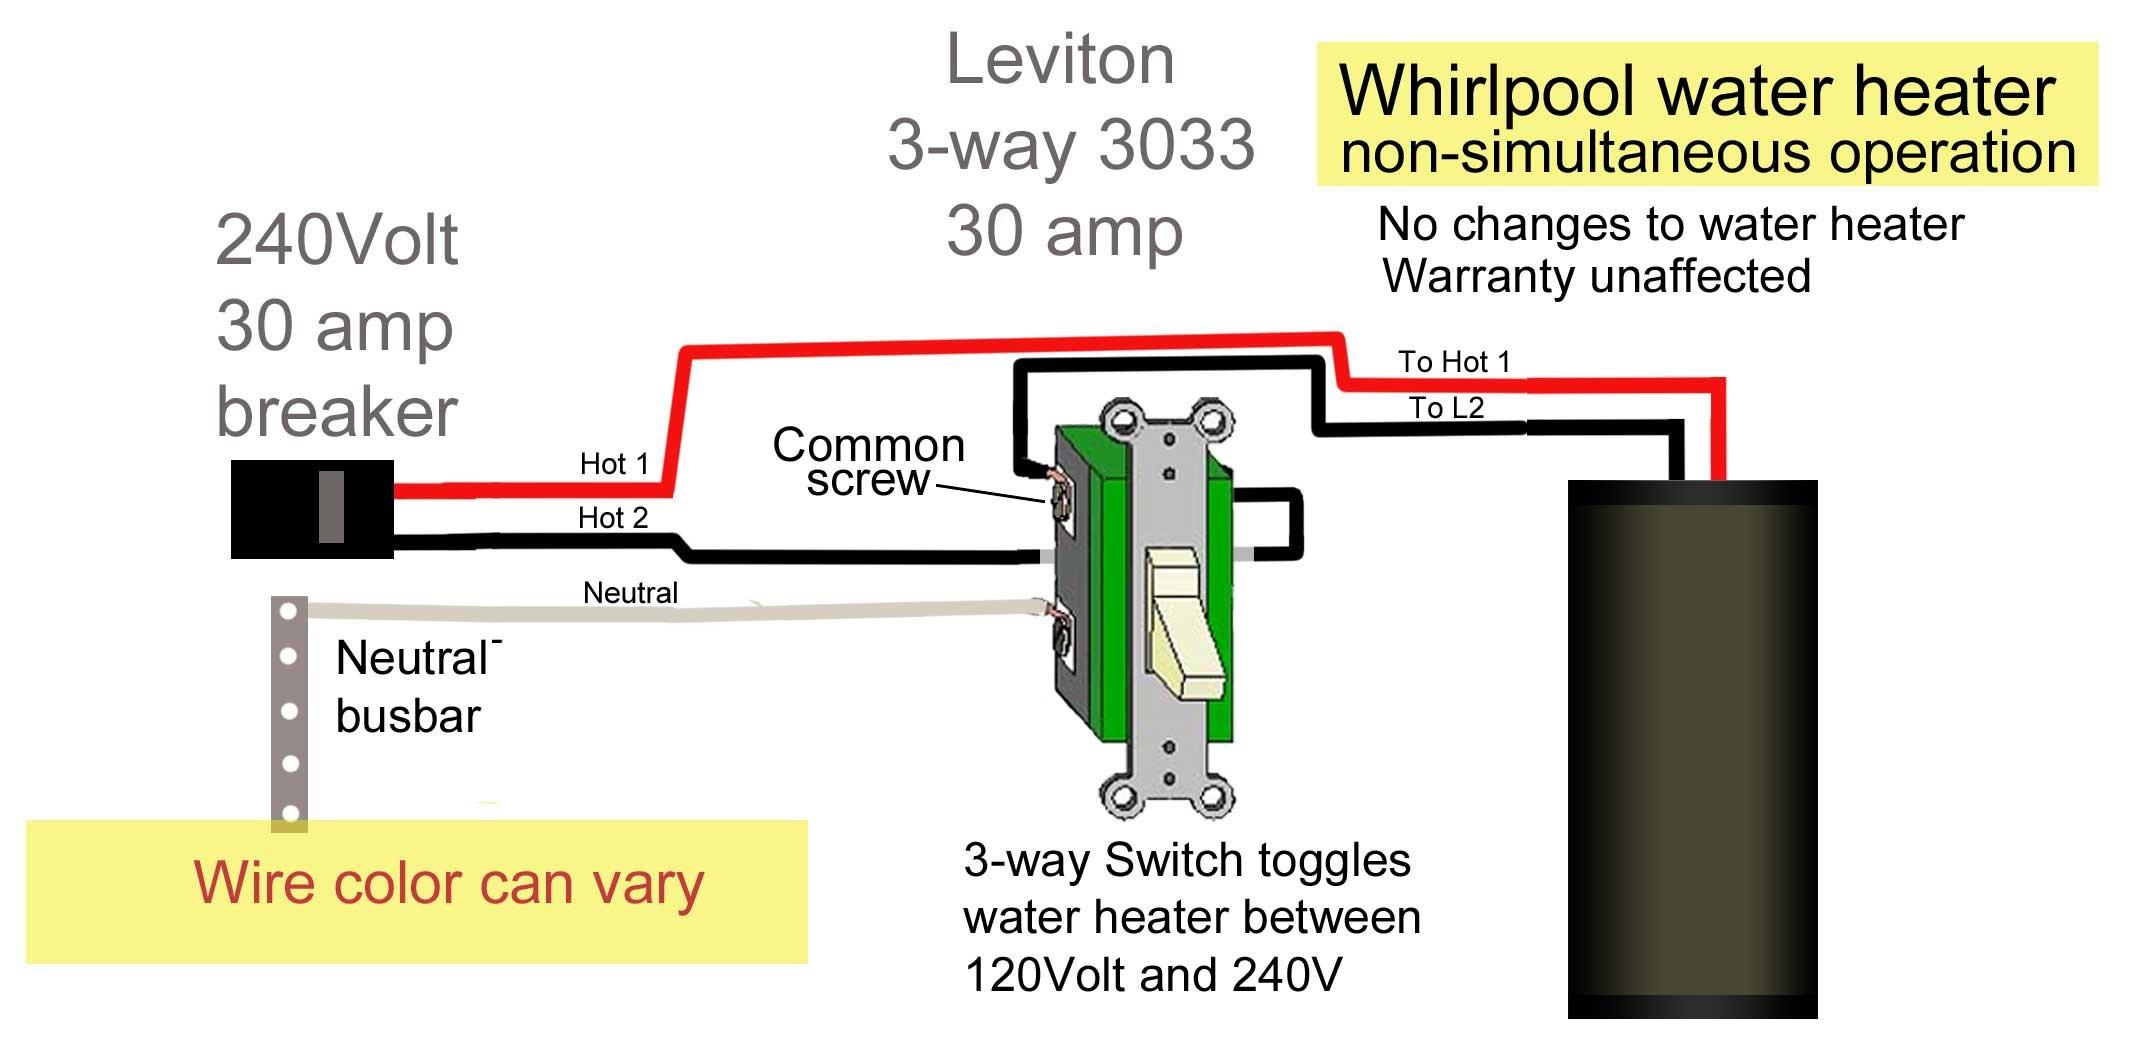 Leviton 3 Way Switch Wiring Diagram Diagram Leviton 3 Way Switch Wiring Exceptional Light Diagrams Afif Of Leviton 3 Way Switch Wiring Diagram